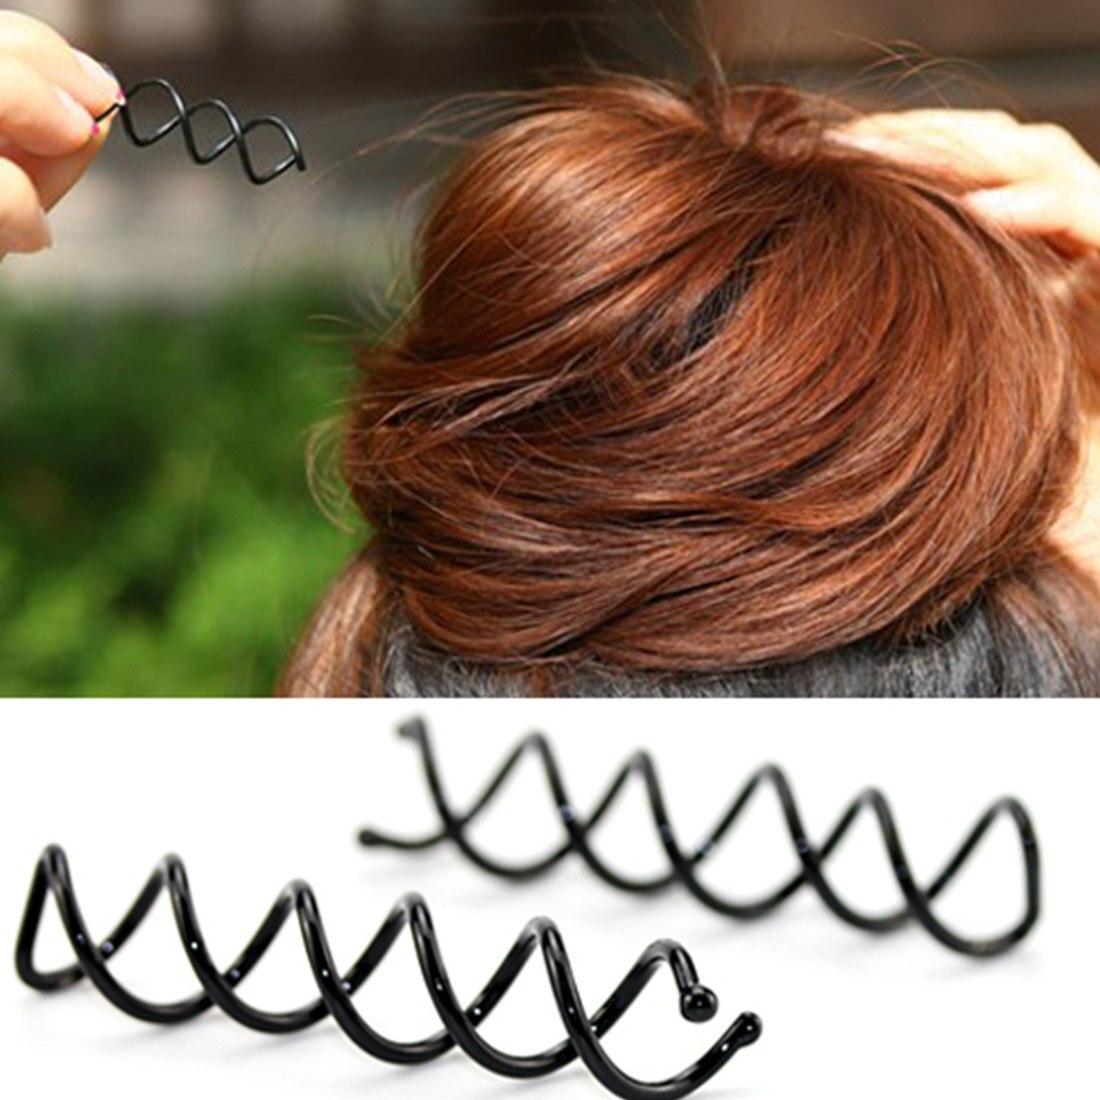 10Pcs Spiral Spin Screw Pin Hair Clip Twist Barrette Black New Hairpins Hair Band Accessories